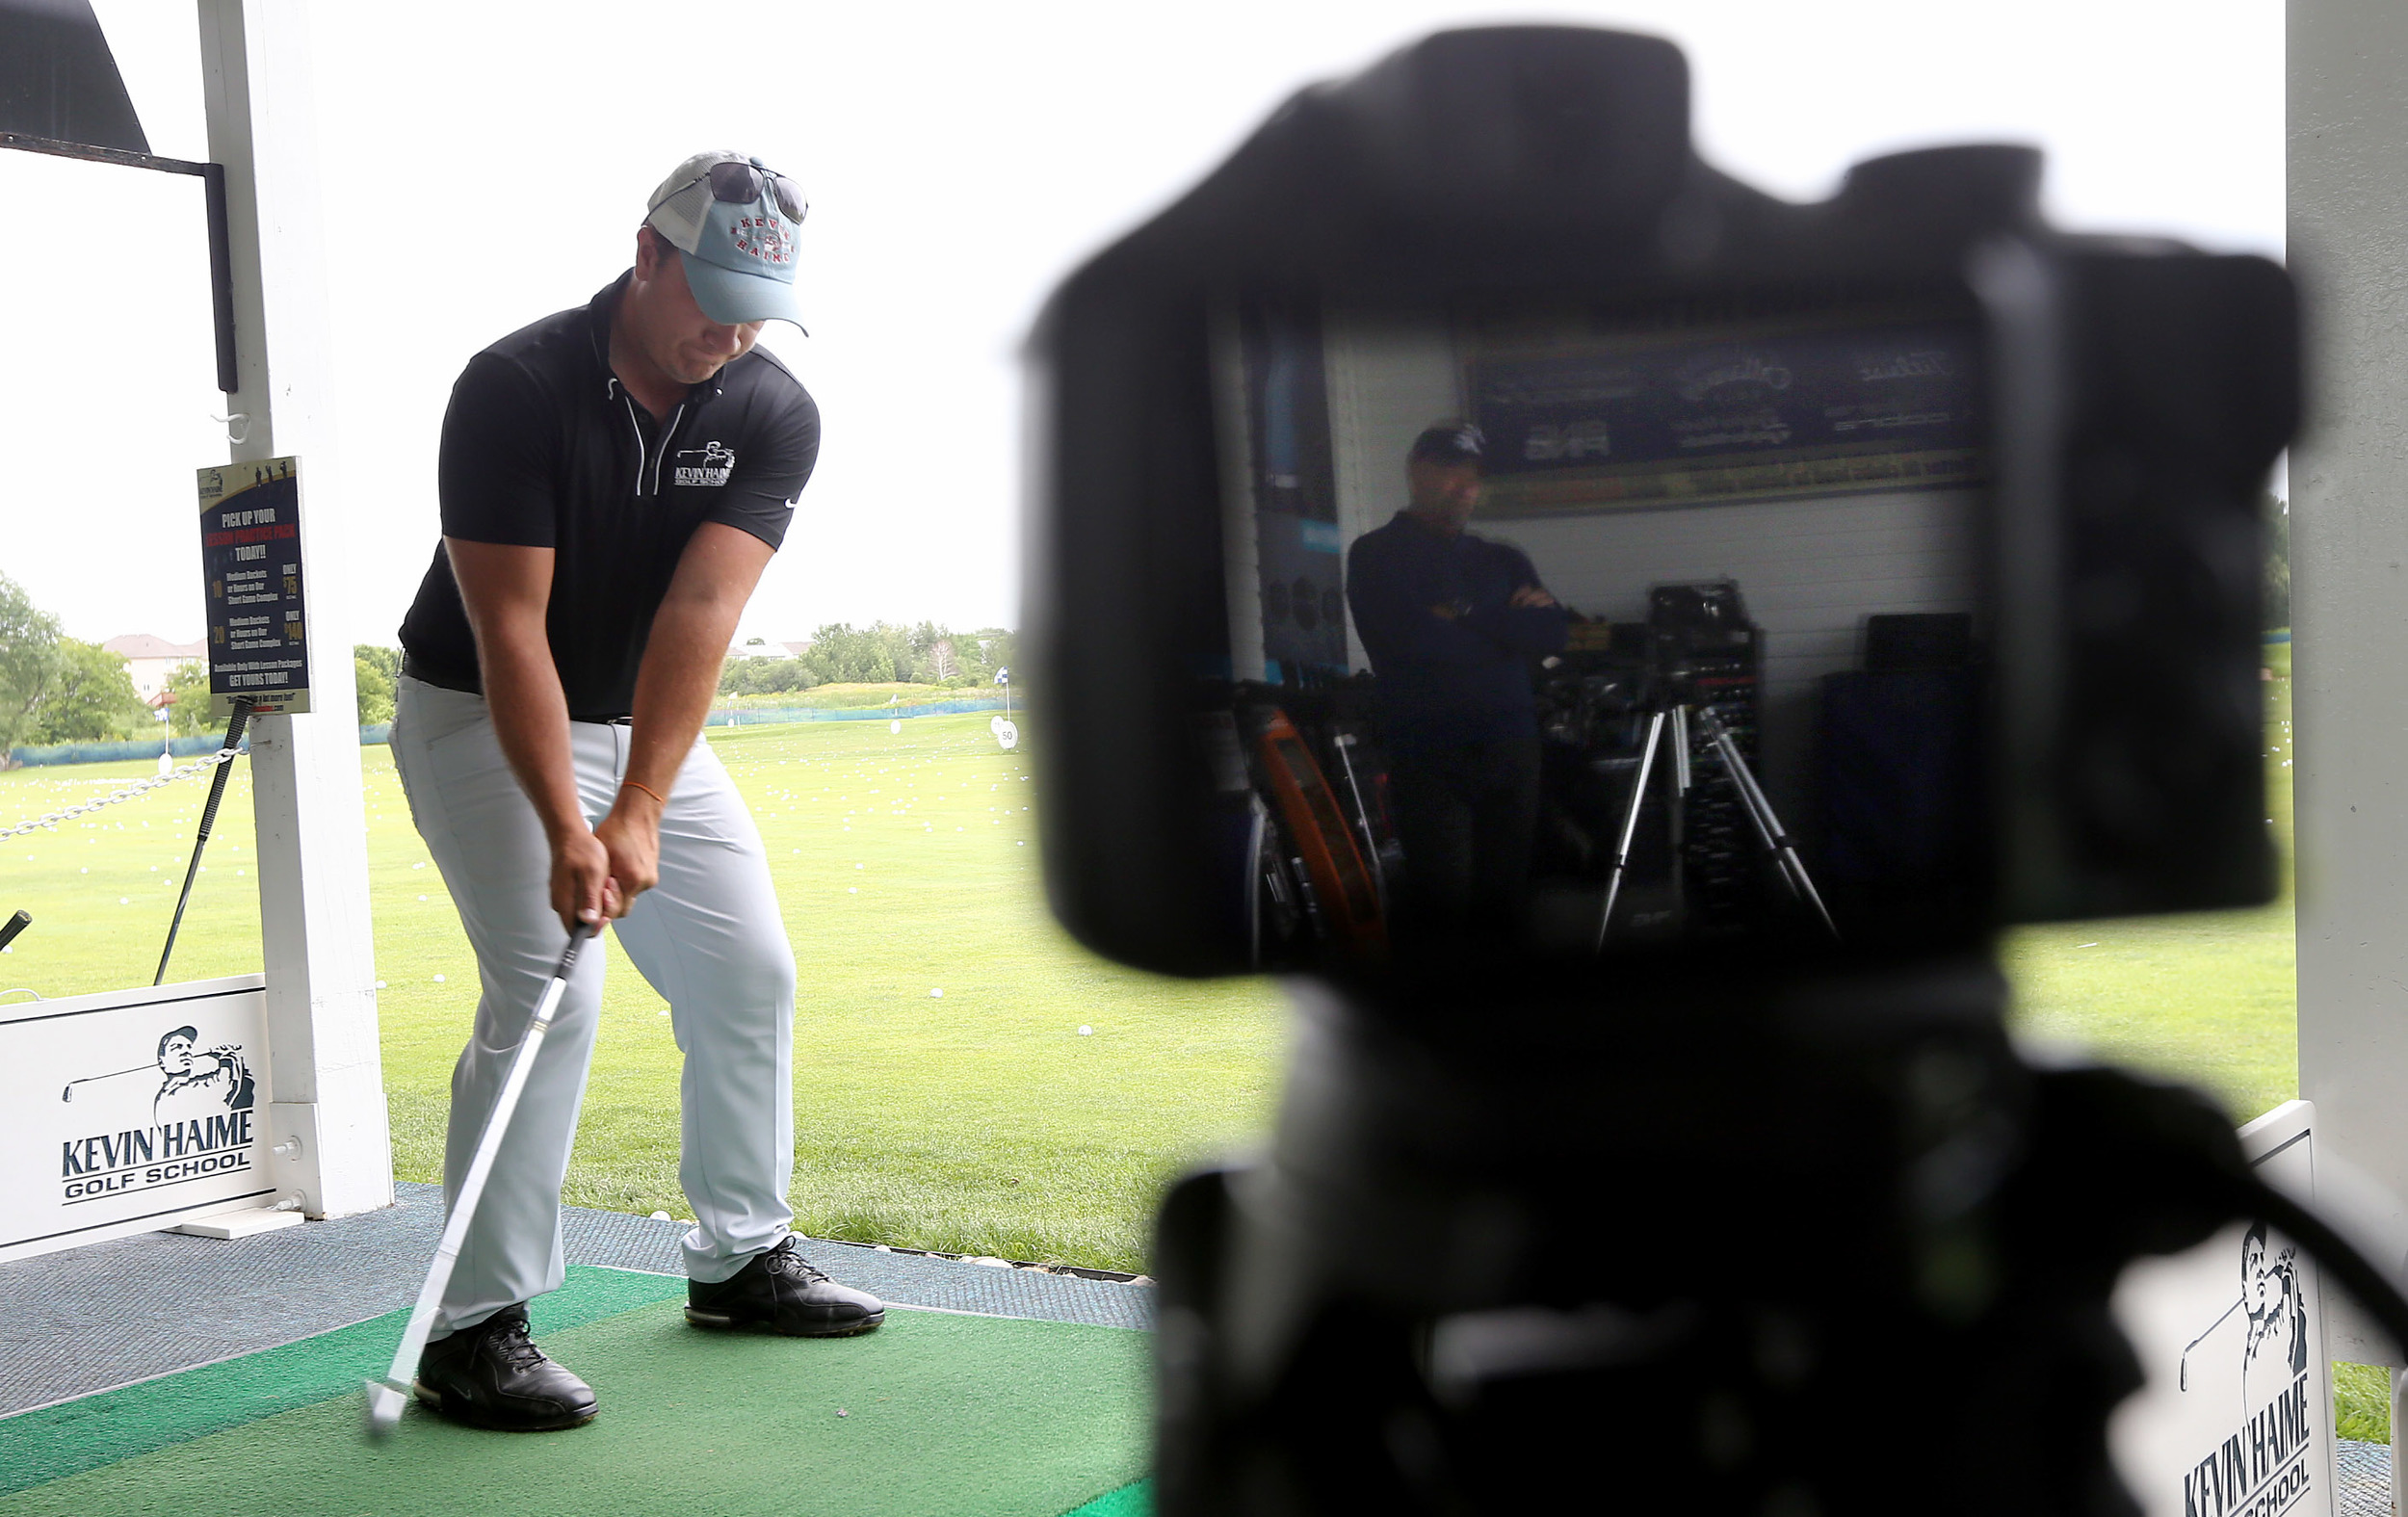 Video analysis of Golf Swing